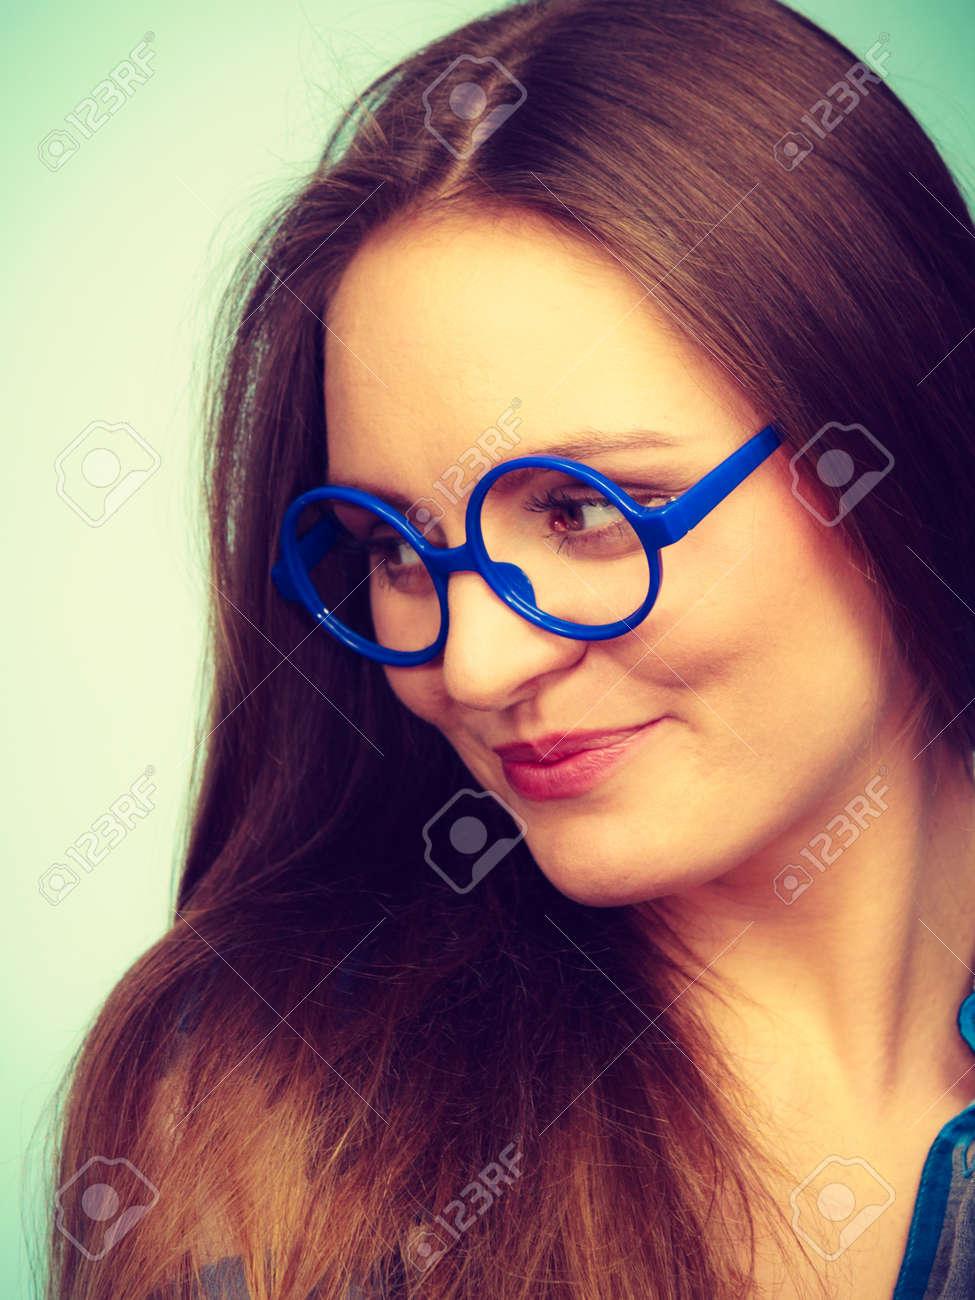 Weird Fun Glasses 11